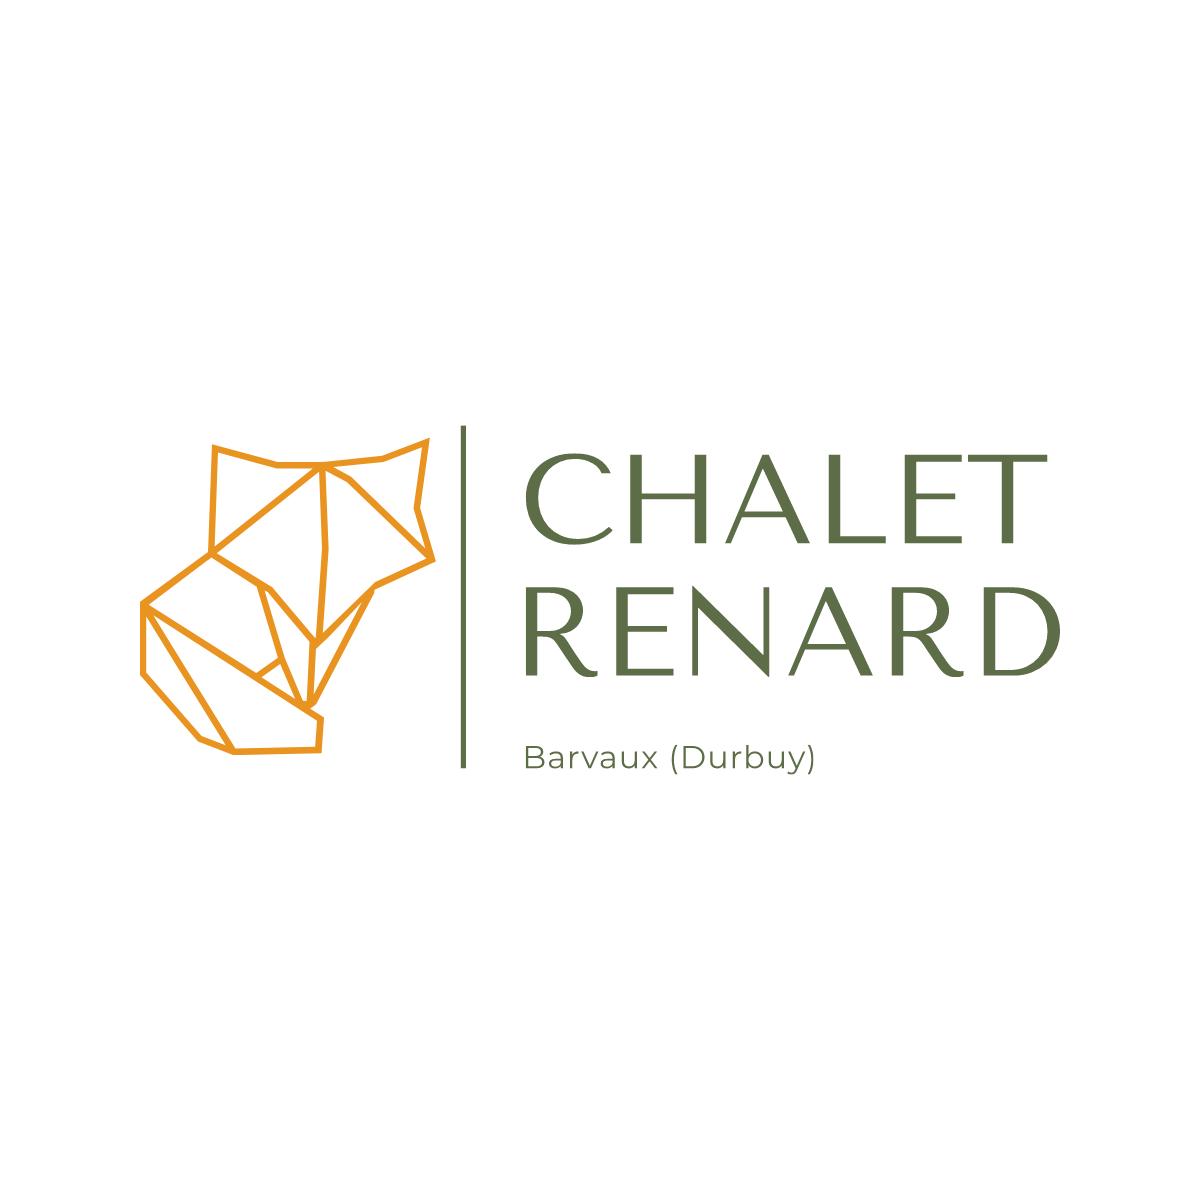 Chalet renard